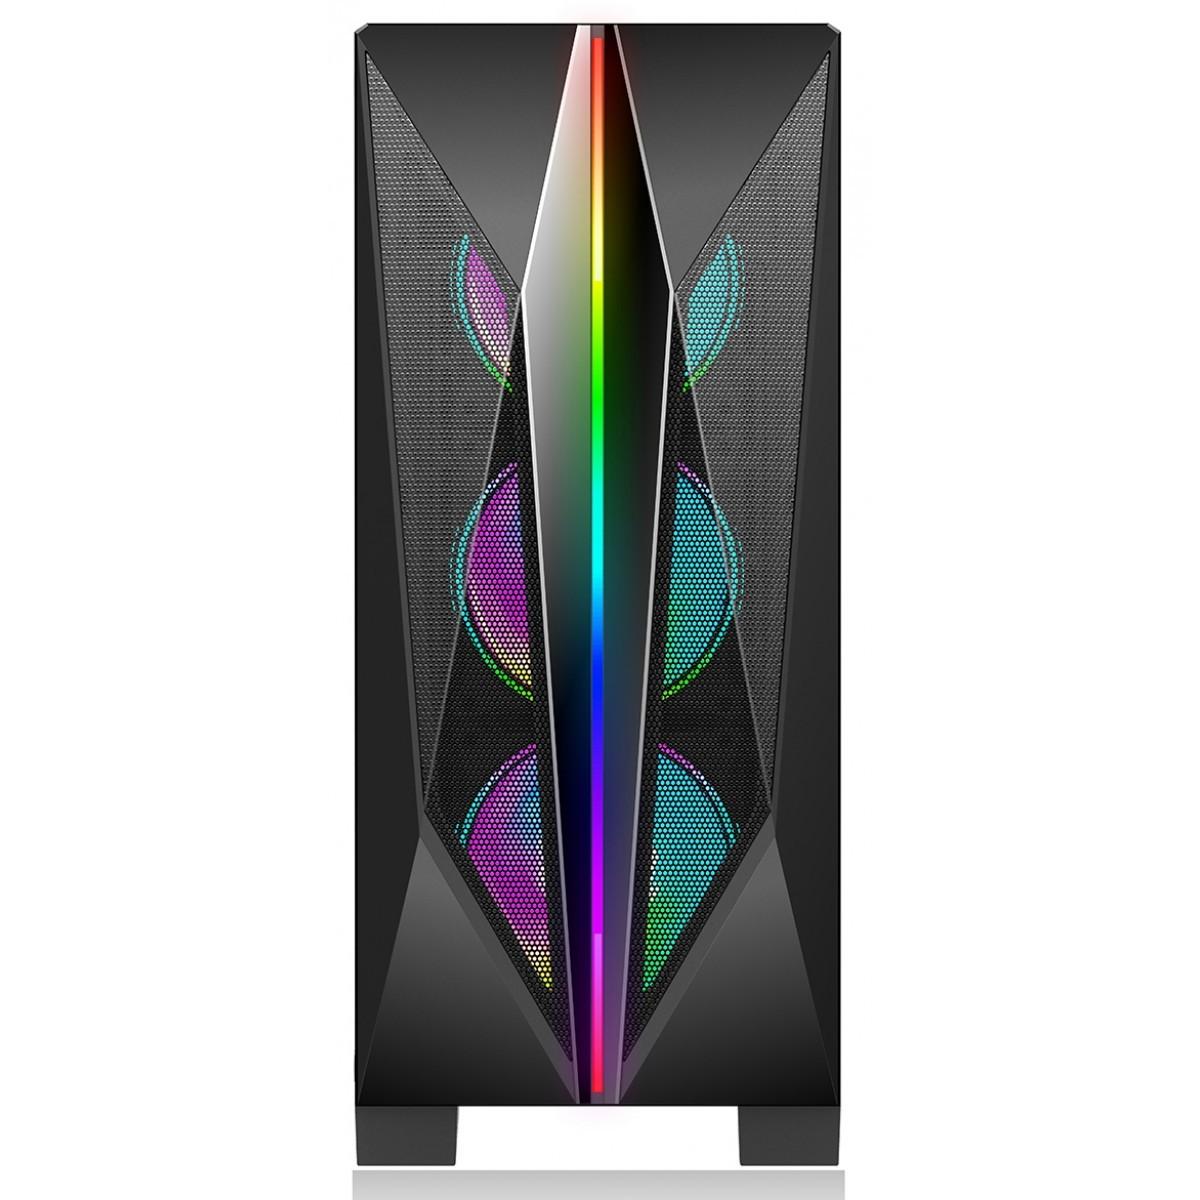 Gabinete Gamer Liketec Killer RGB, Mid Tower, Vidro Temperado, Black, Sem Fonte, Com 3 Fans